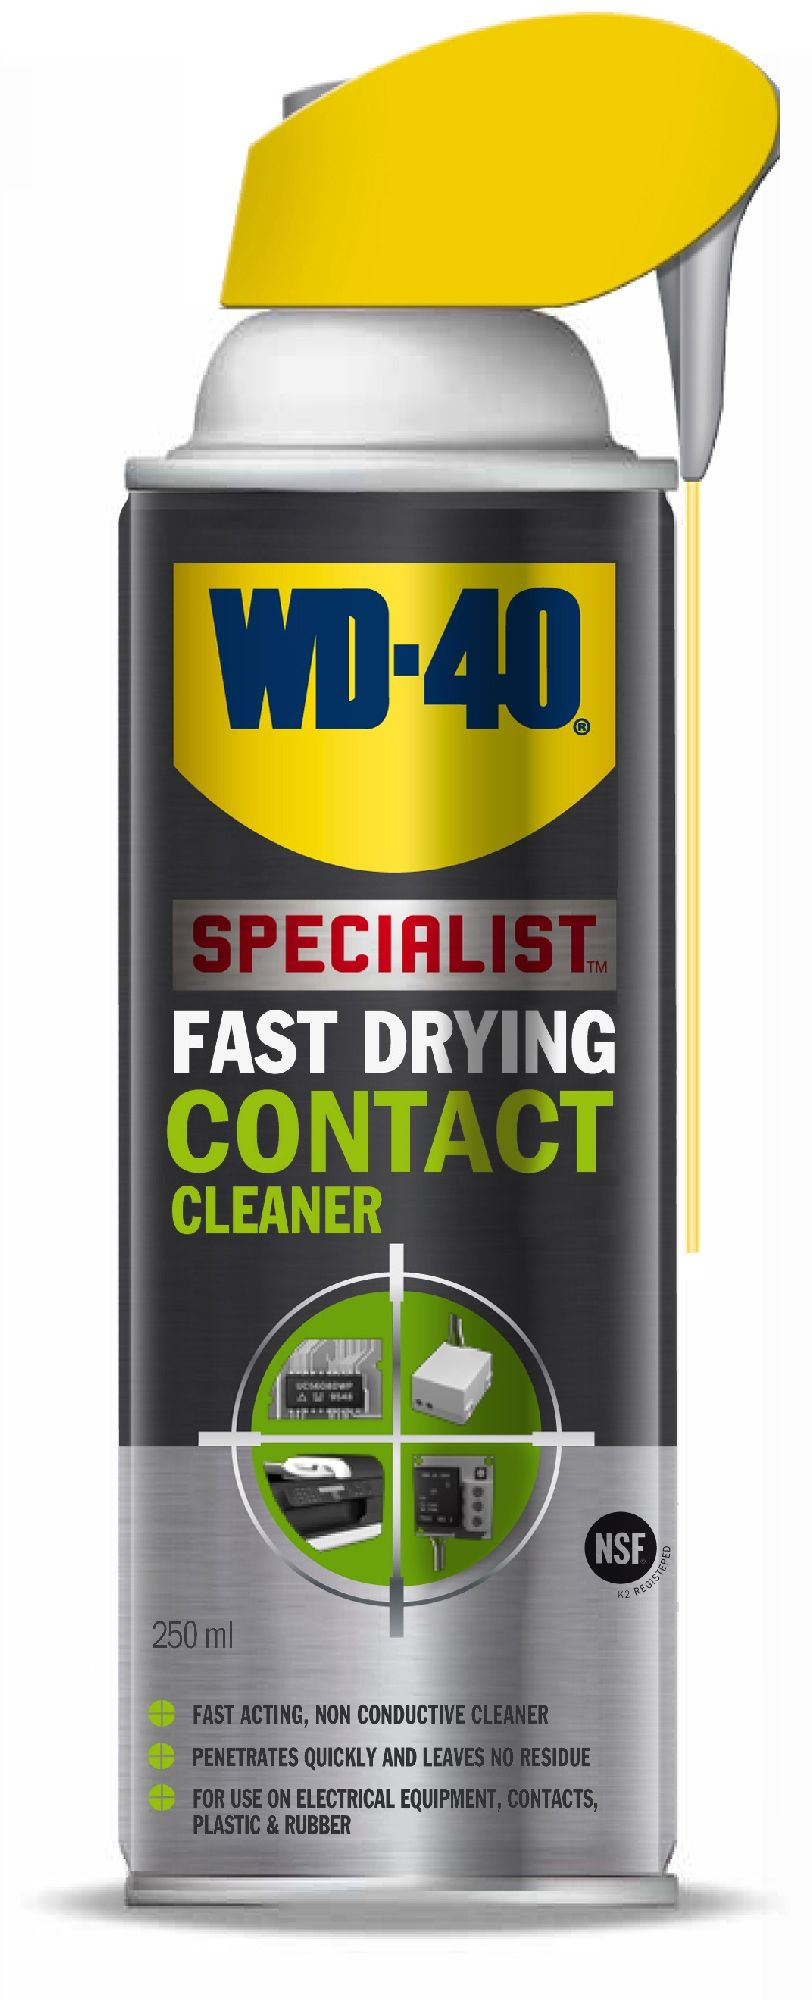 WD-40 CONTACT CLEANER 250ml SPECJALIST (03-119) Transmisiju un bremžu eļļas